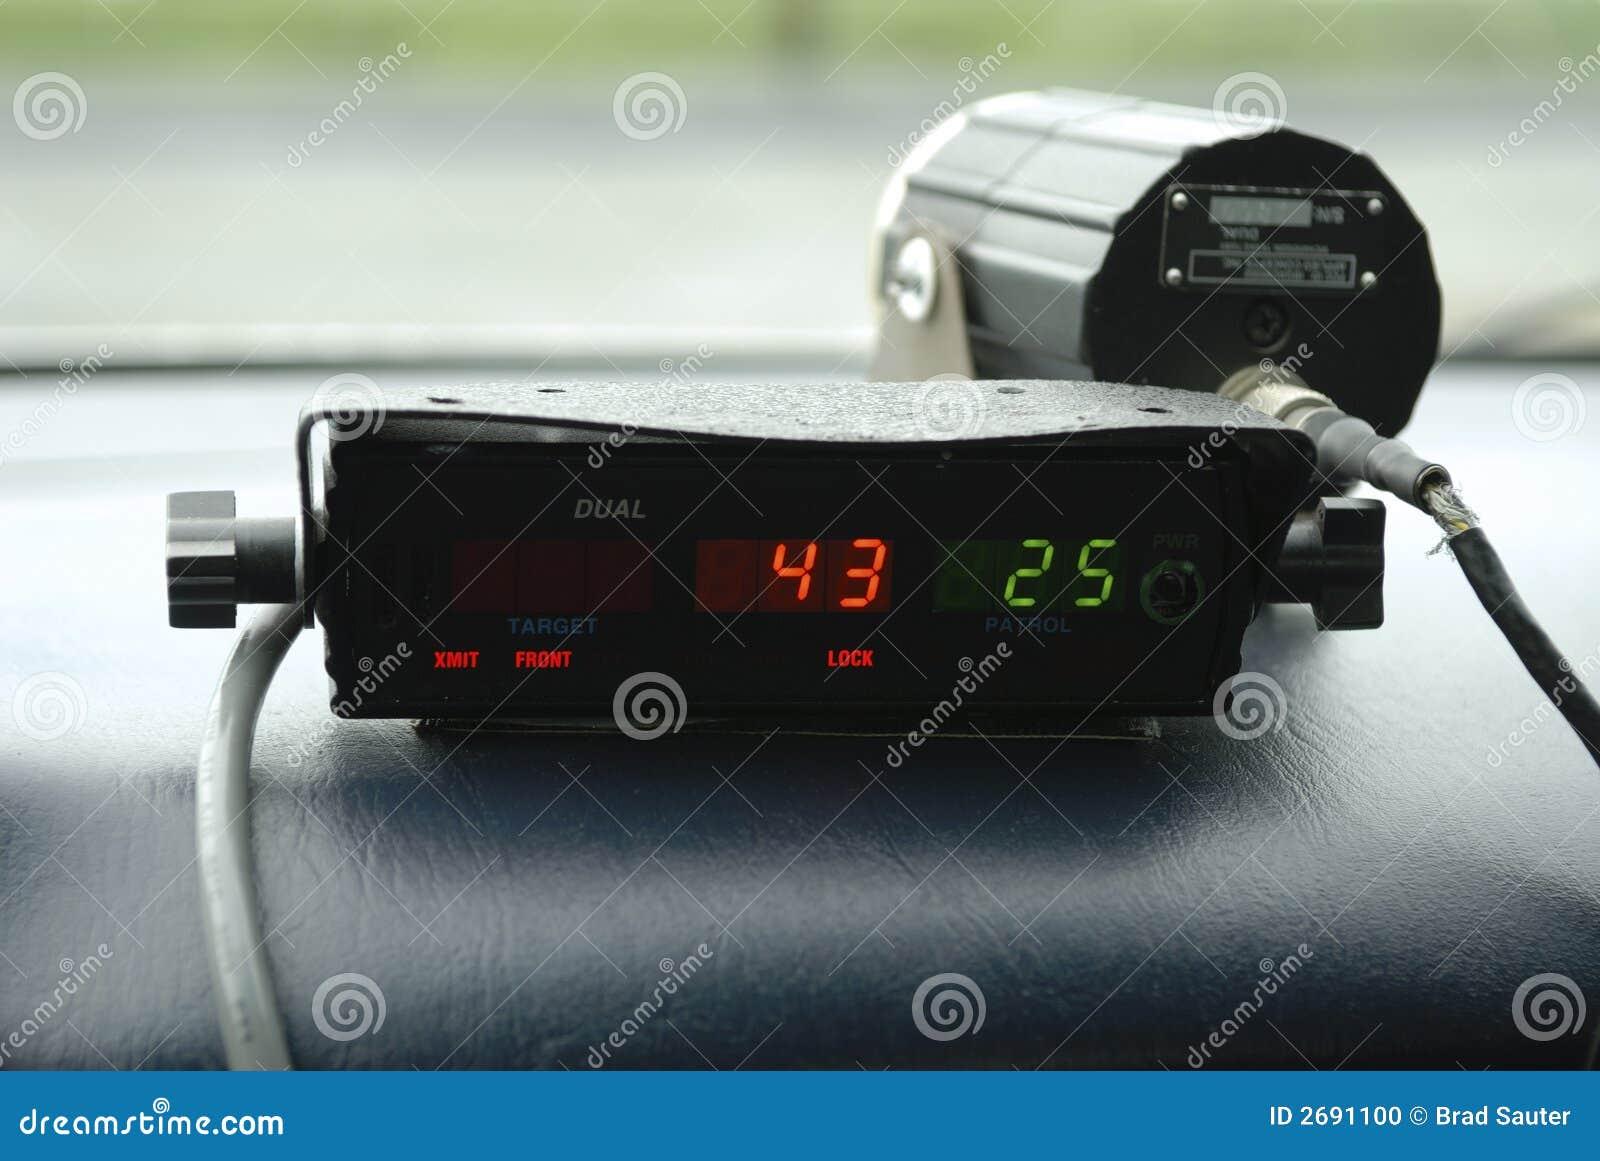 Download Police Radar 1 stock photo. Image of constable, camera - 2691100